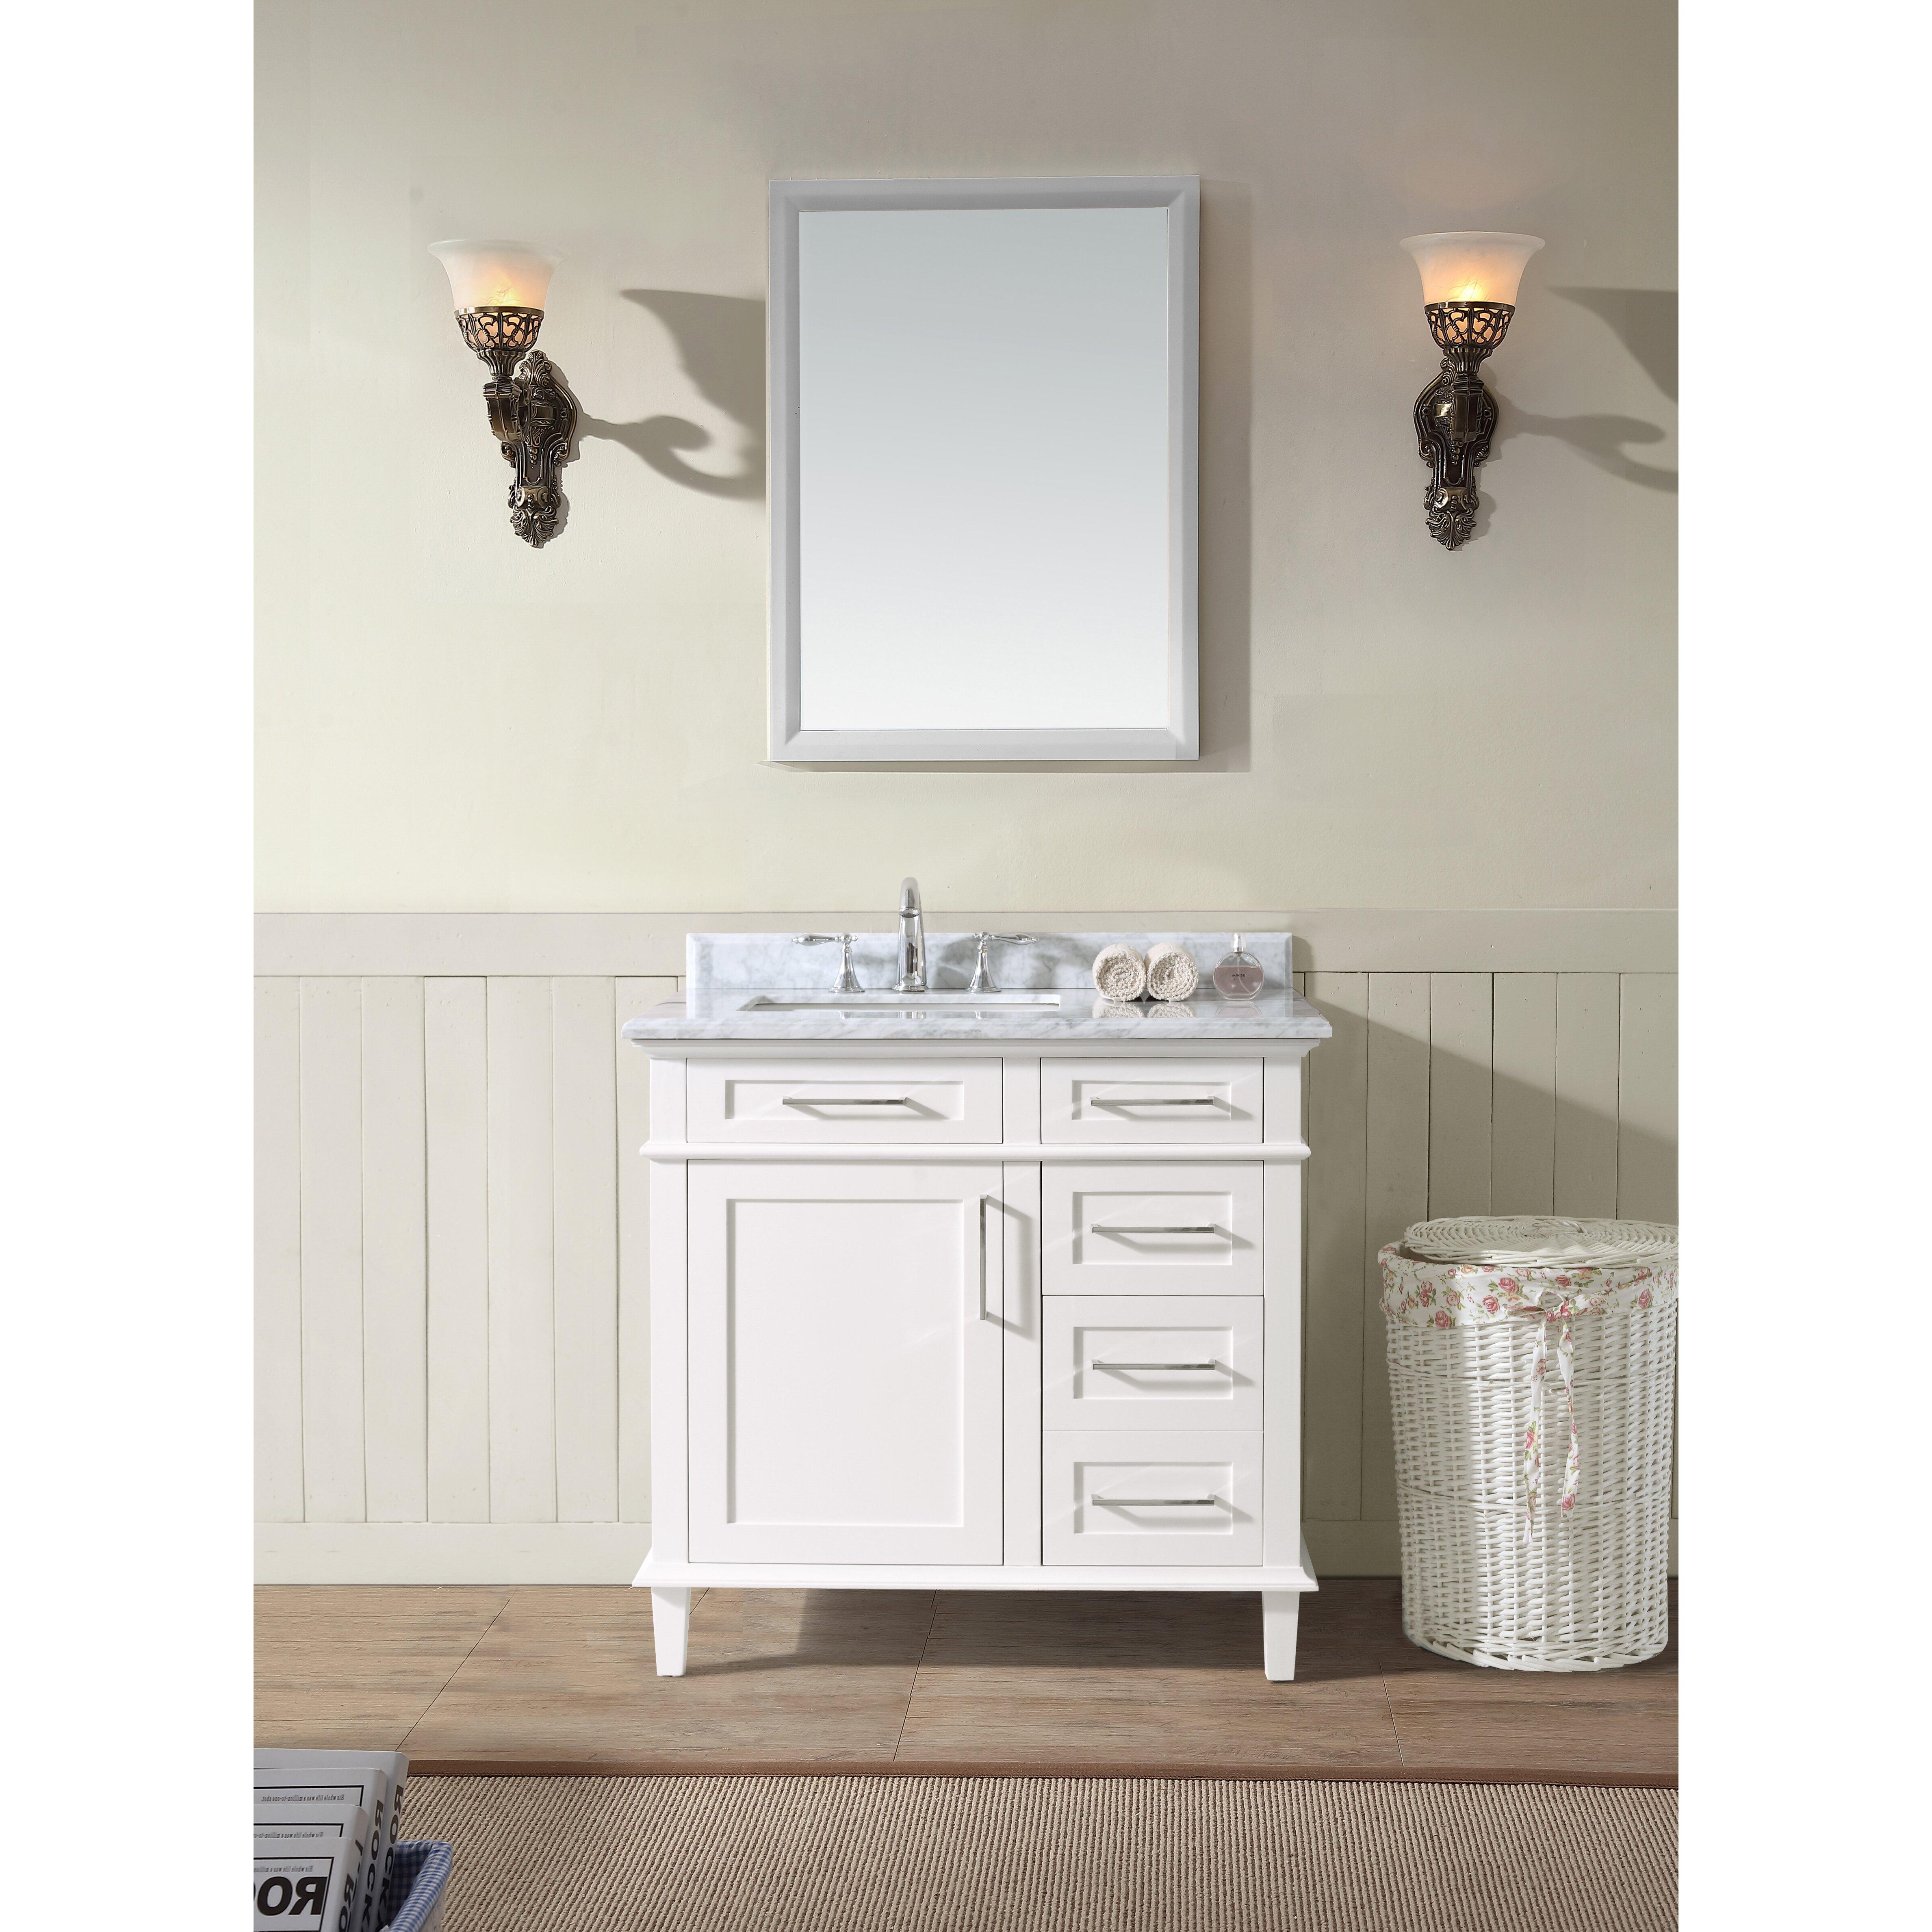 Ari Kitchen  amp  Bath Newport 36 quot  Single Bathroom Vanity Set. Ari Kitchen   Bath Newport 36  Single Bathroom Vanity Set